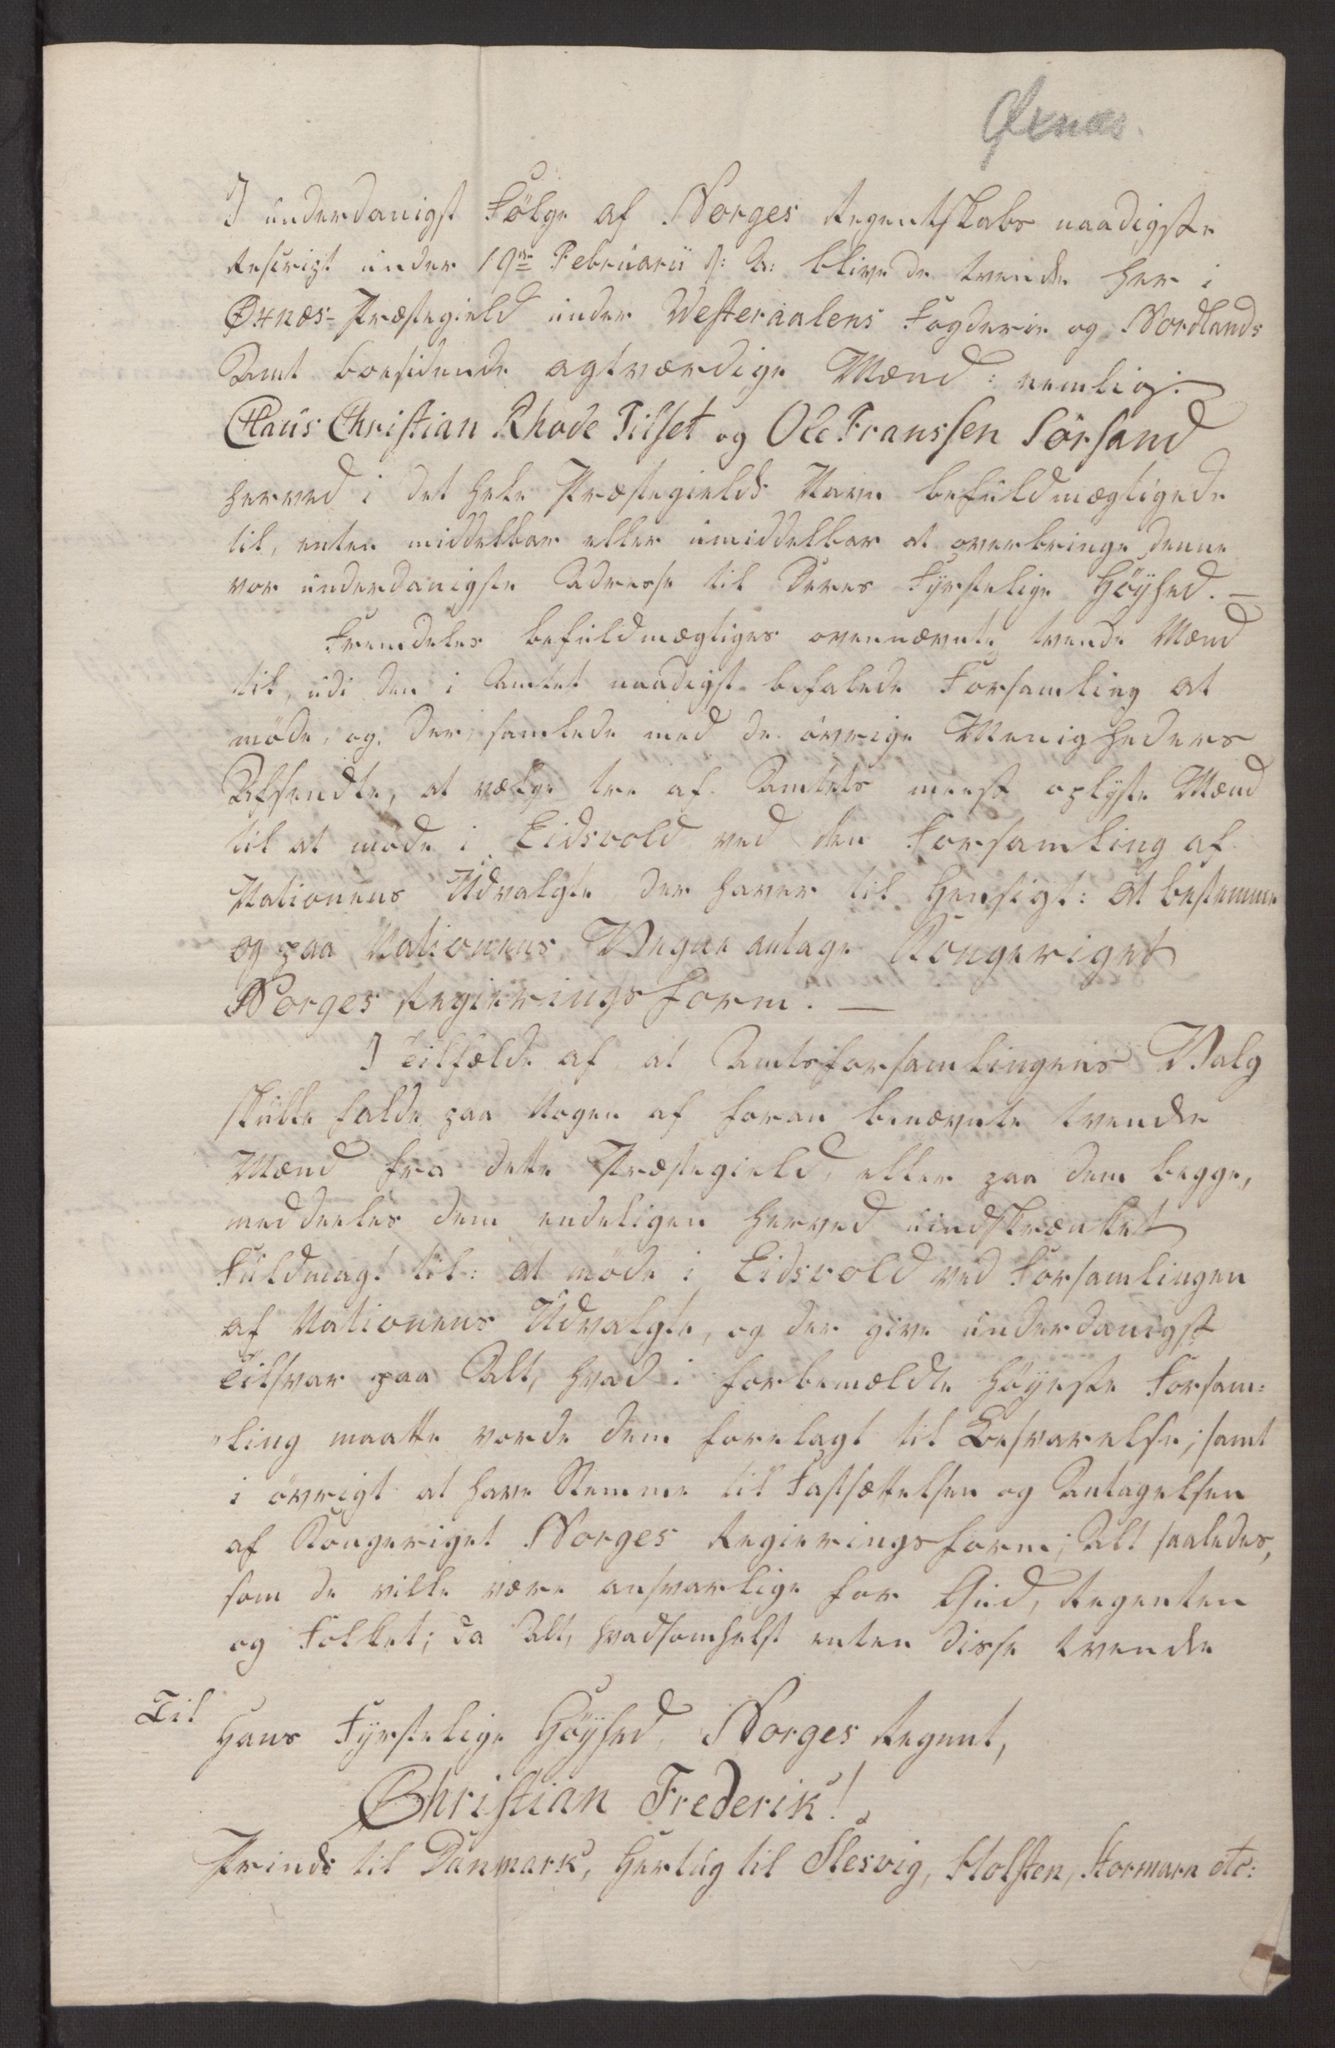 SAT, Nordland amt/fylke*, 1814, s. 52